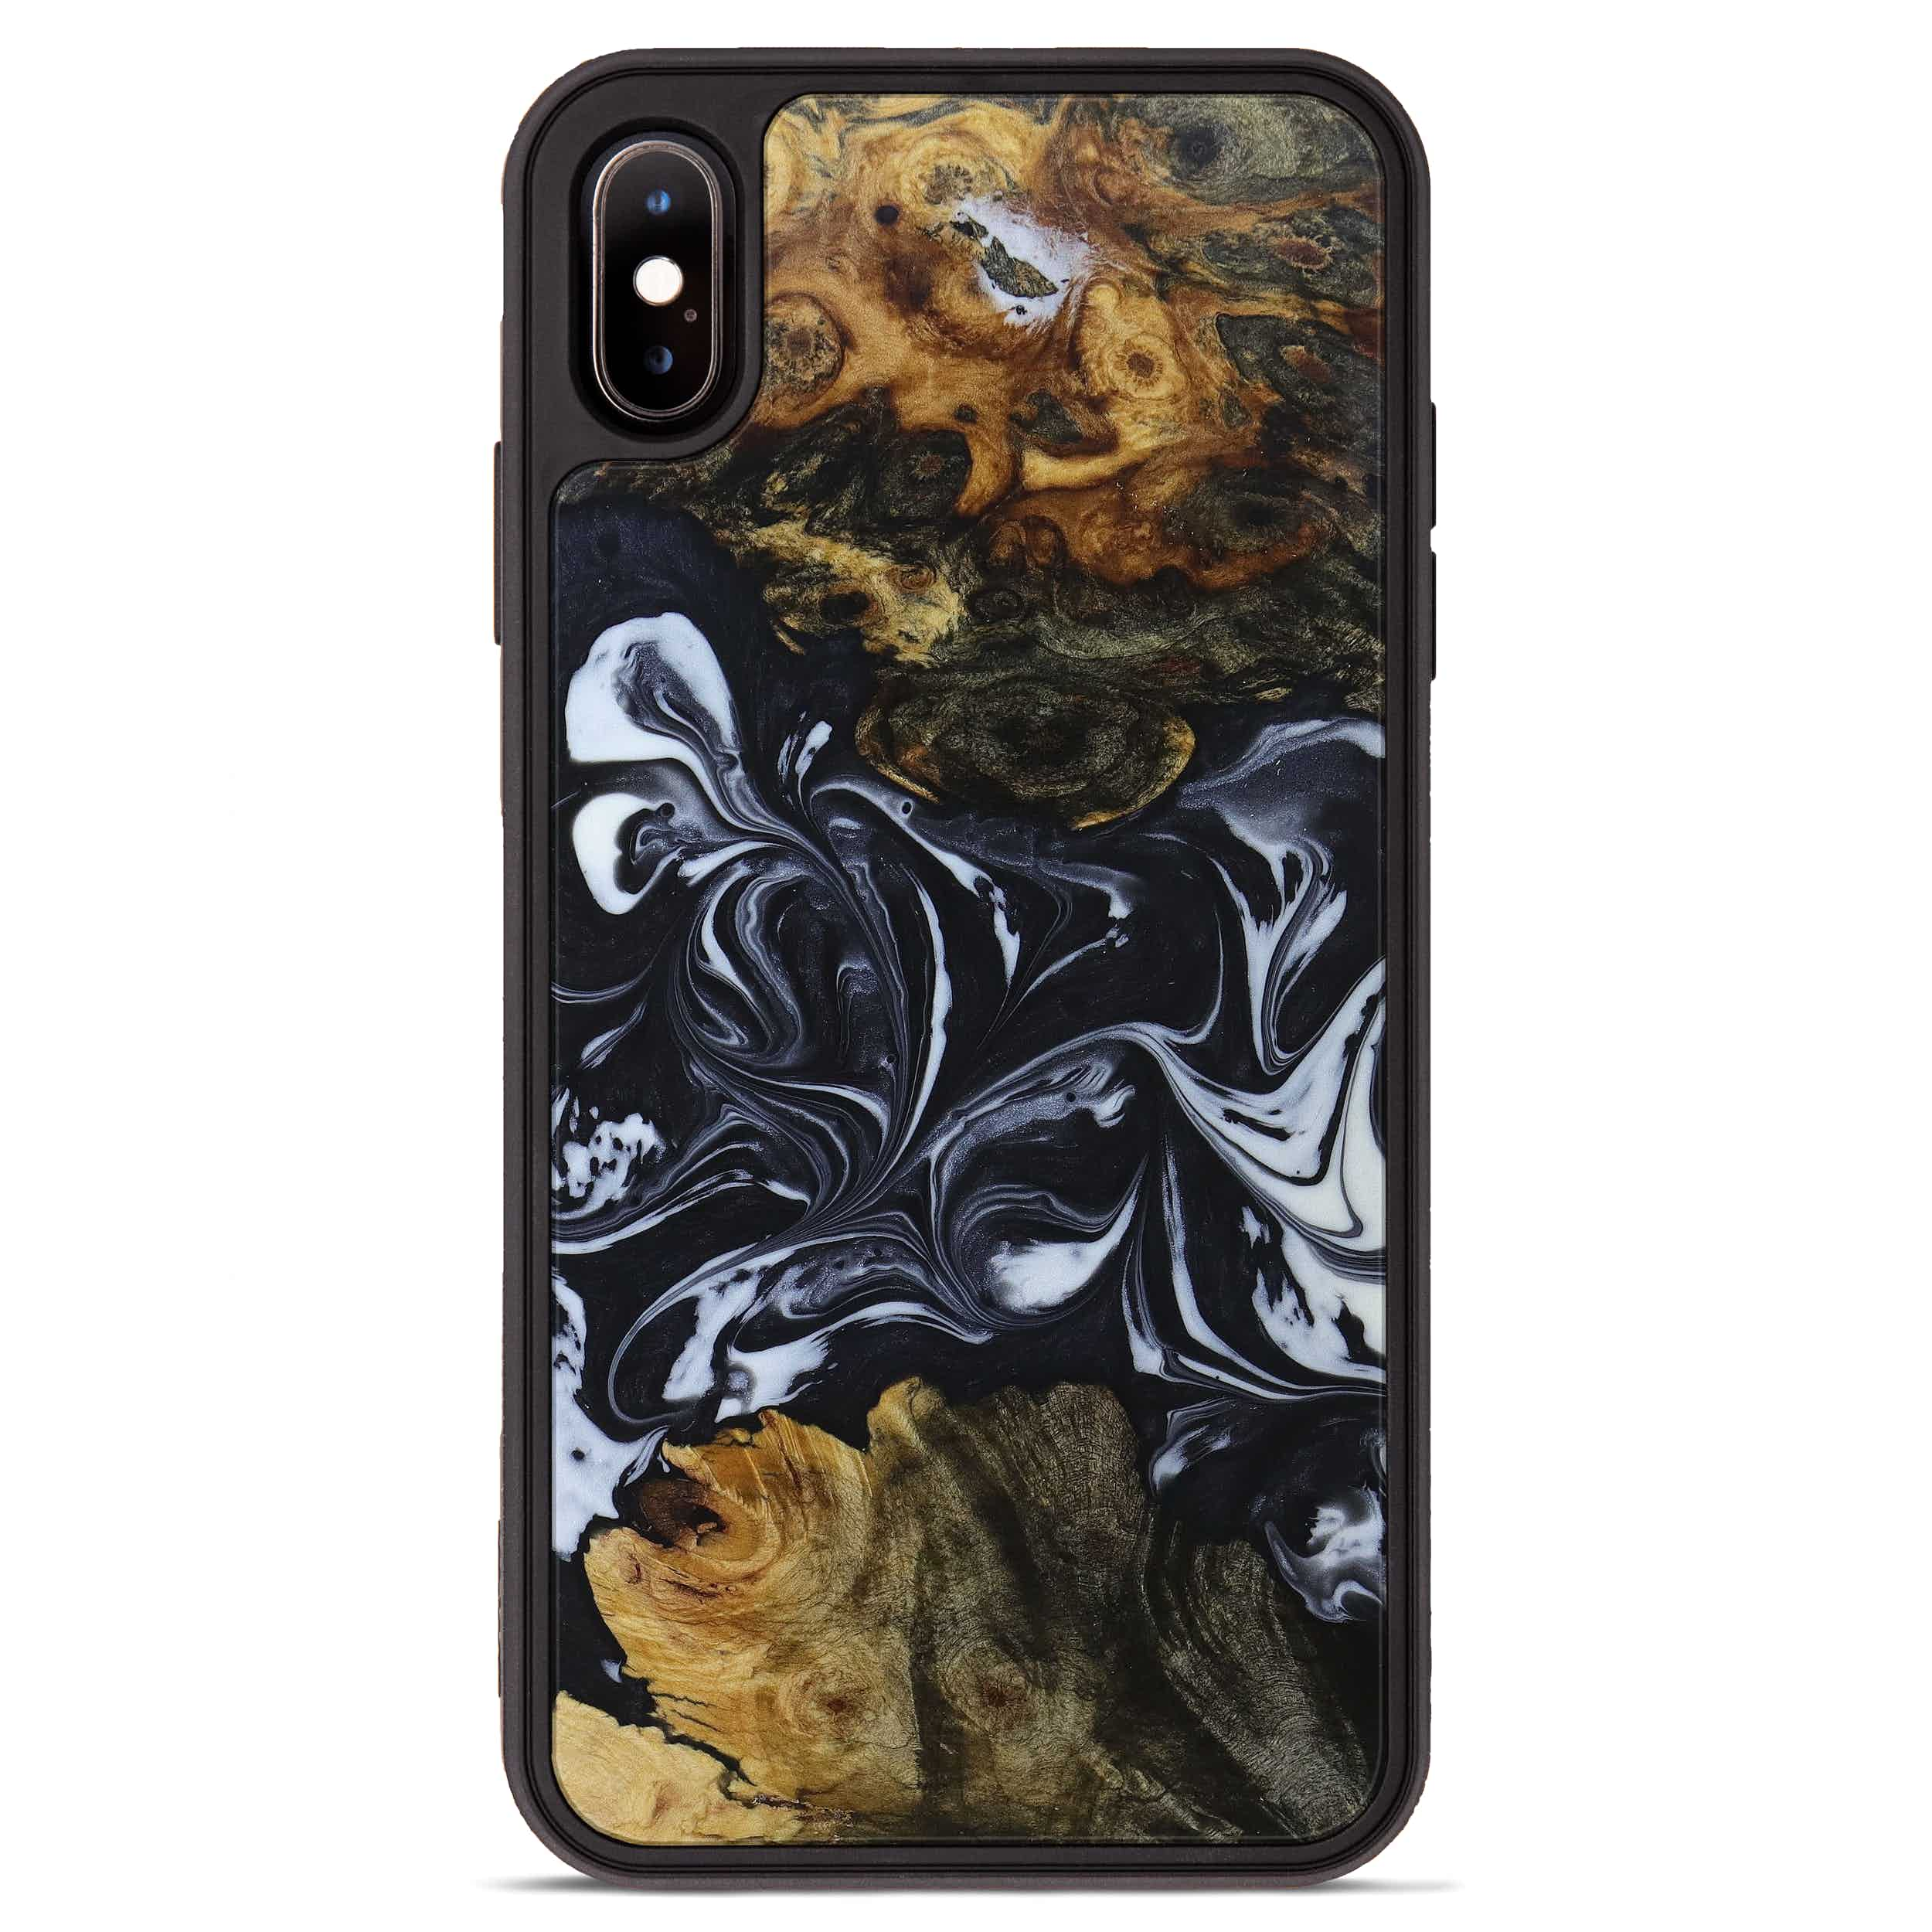 iPhone Xs Max Wood+Resin Phone Case - Winni (Black & White, 397347)